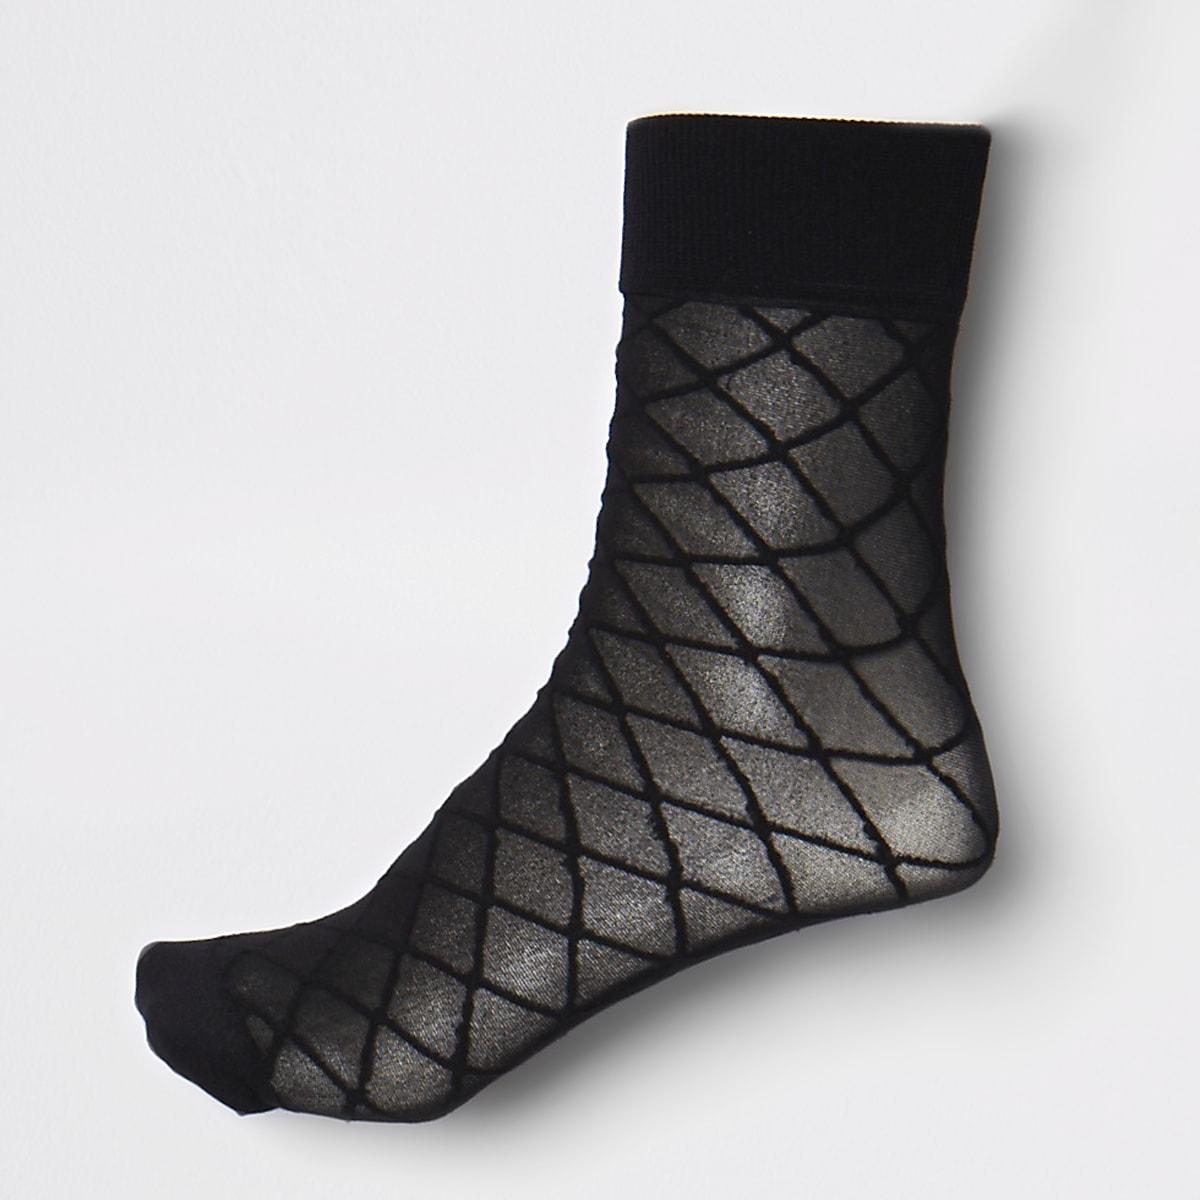 Schwarze Sneakersocken mit Rautenmuster